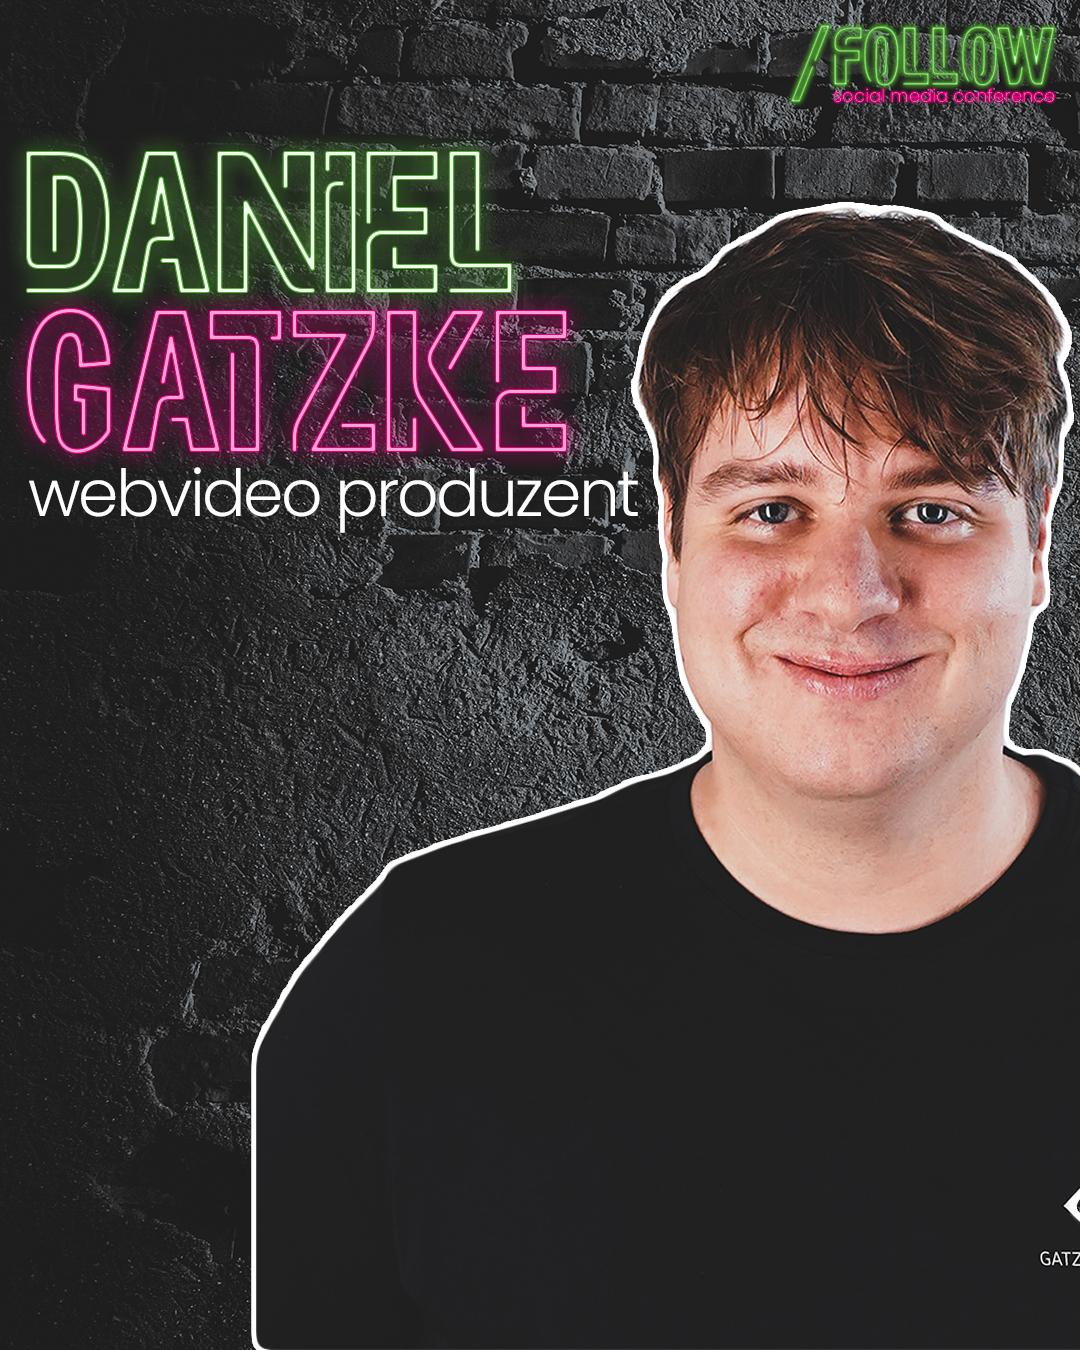 DanielGatzke_Posting